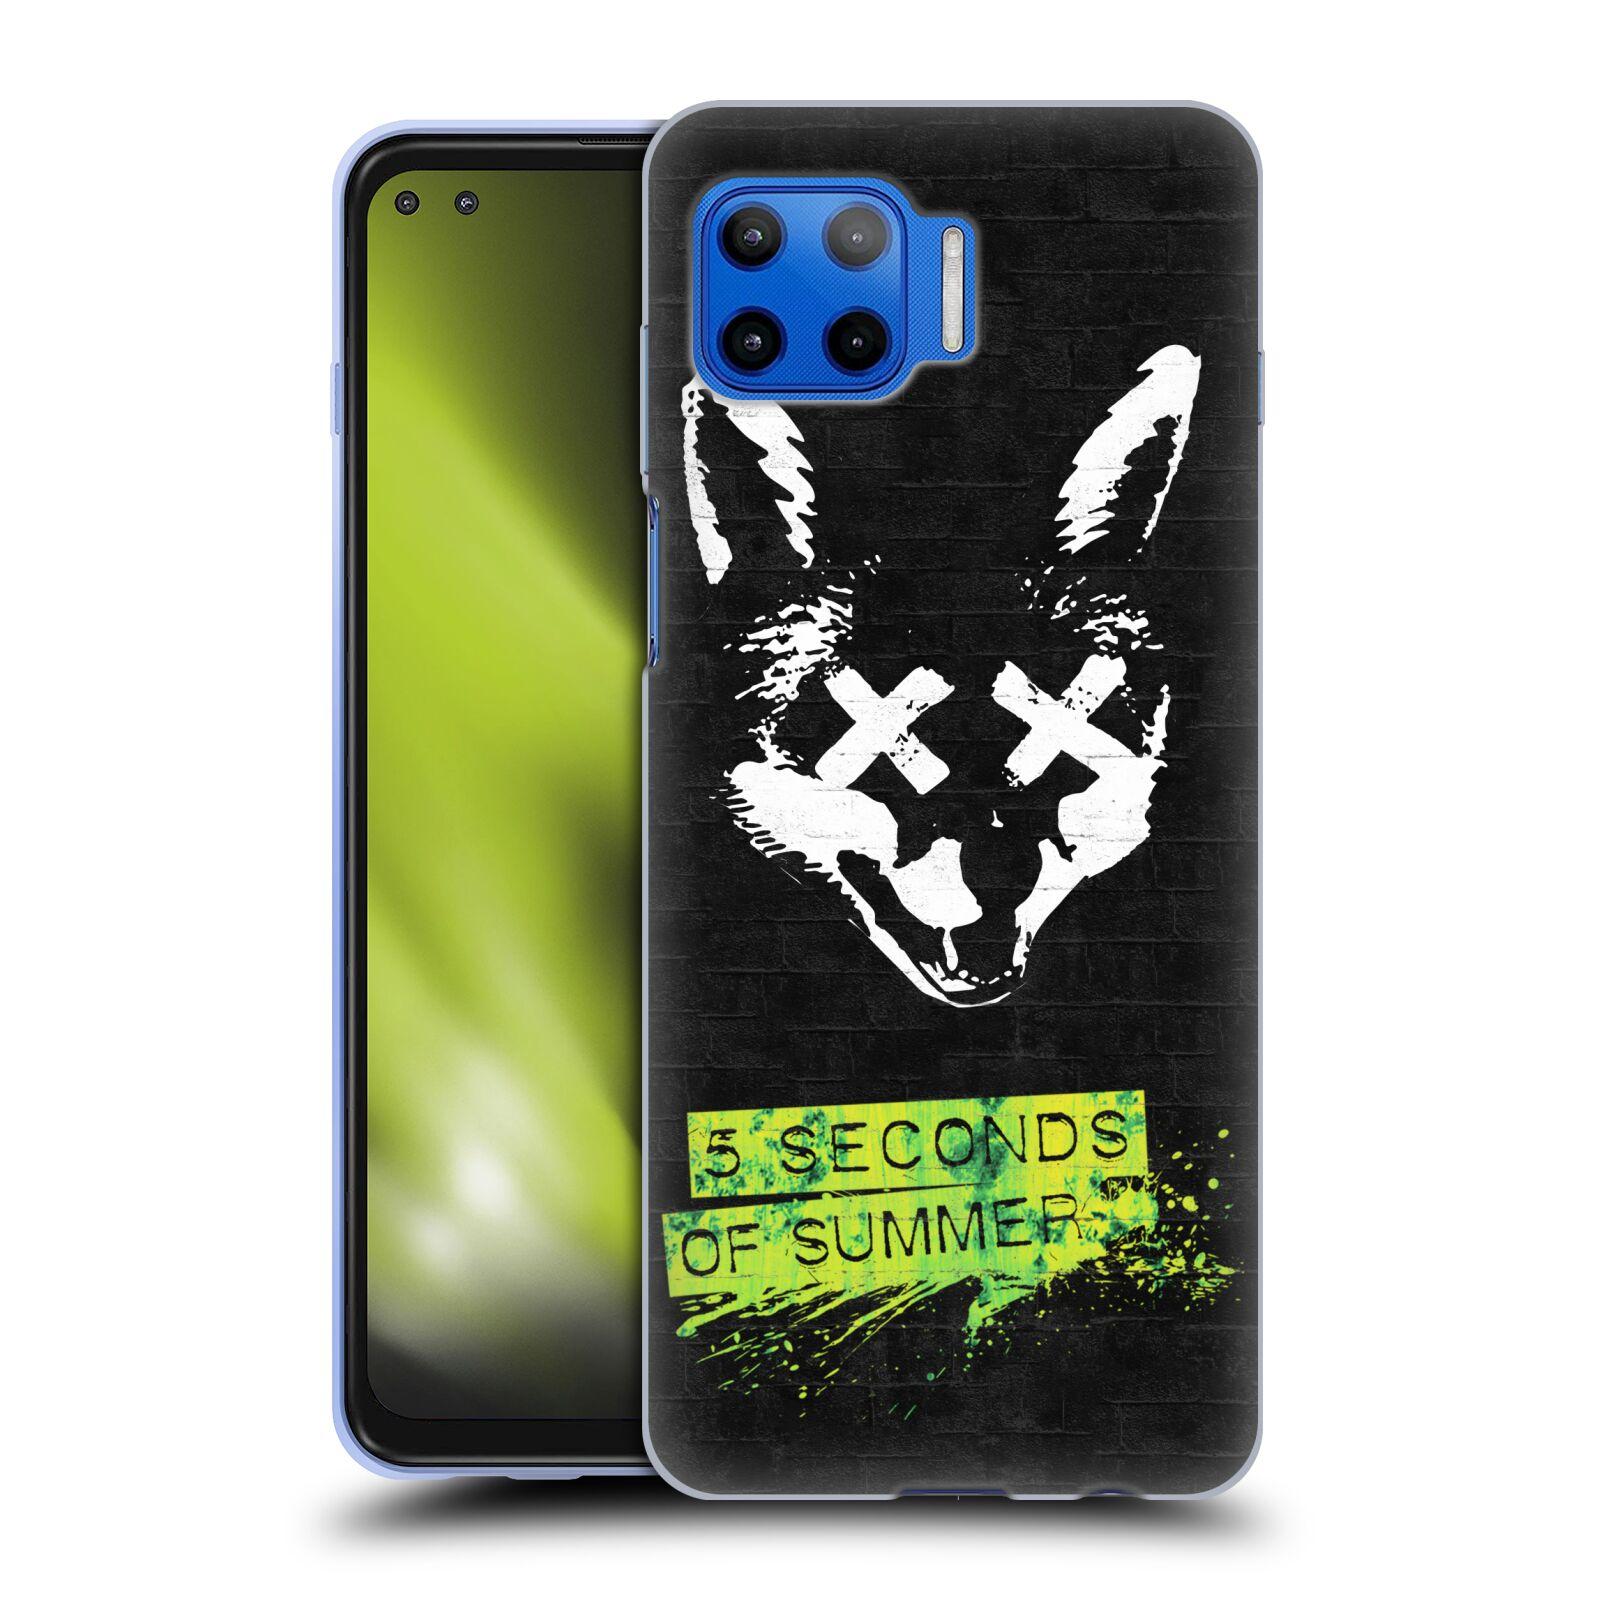 Silikonové pouzdro na mobil Motorola Moto G 5G Plus - Head Case - 5 Seconds of Summer - Fox